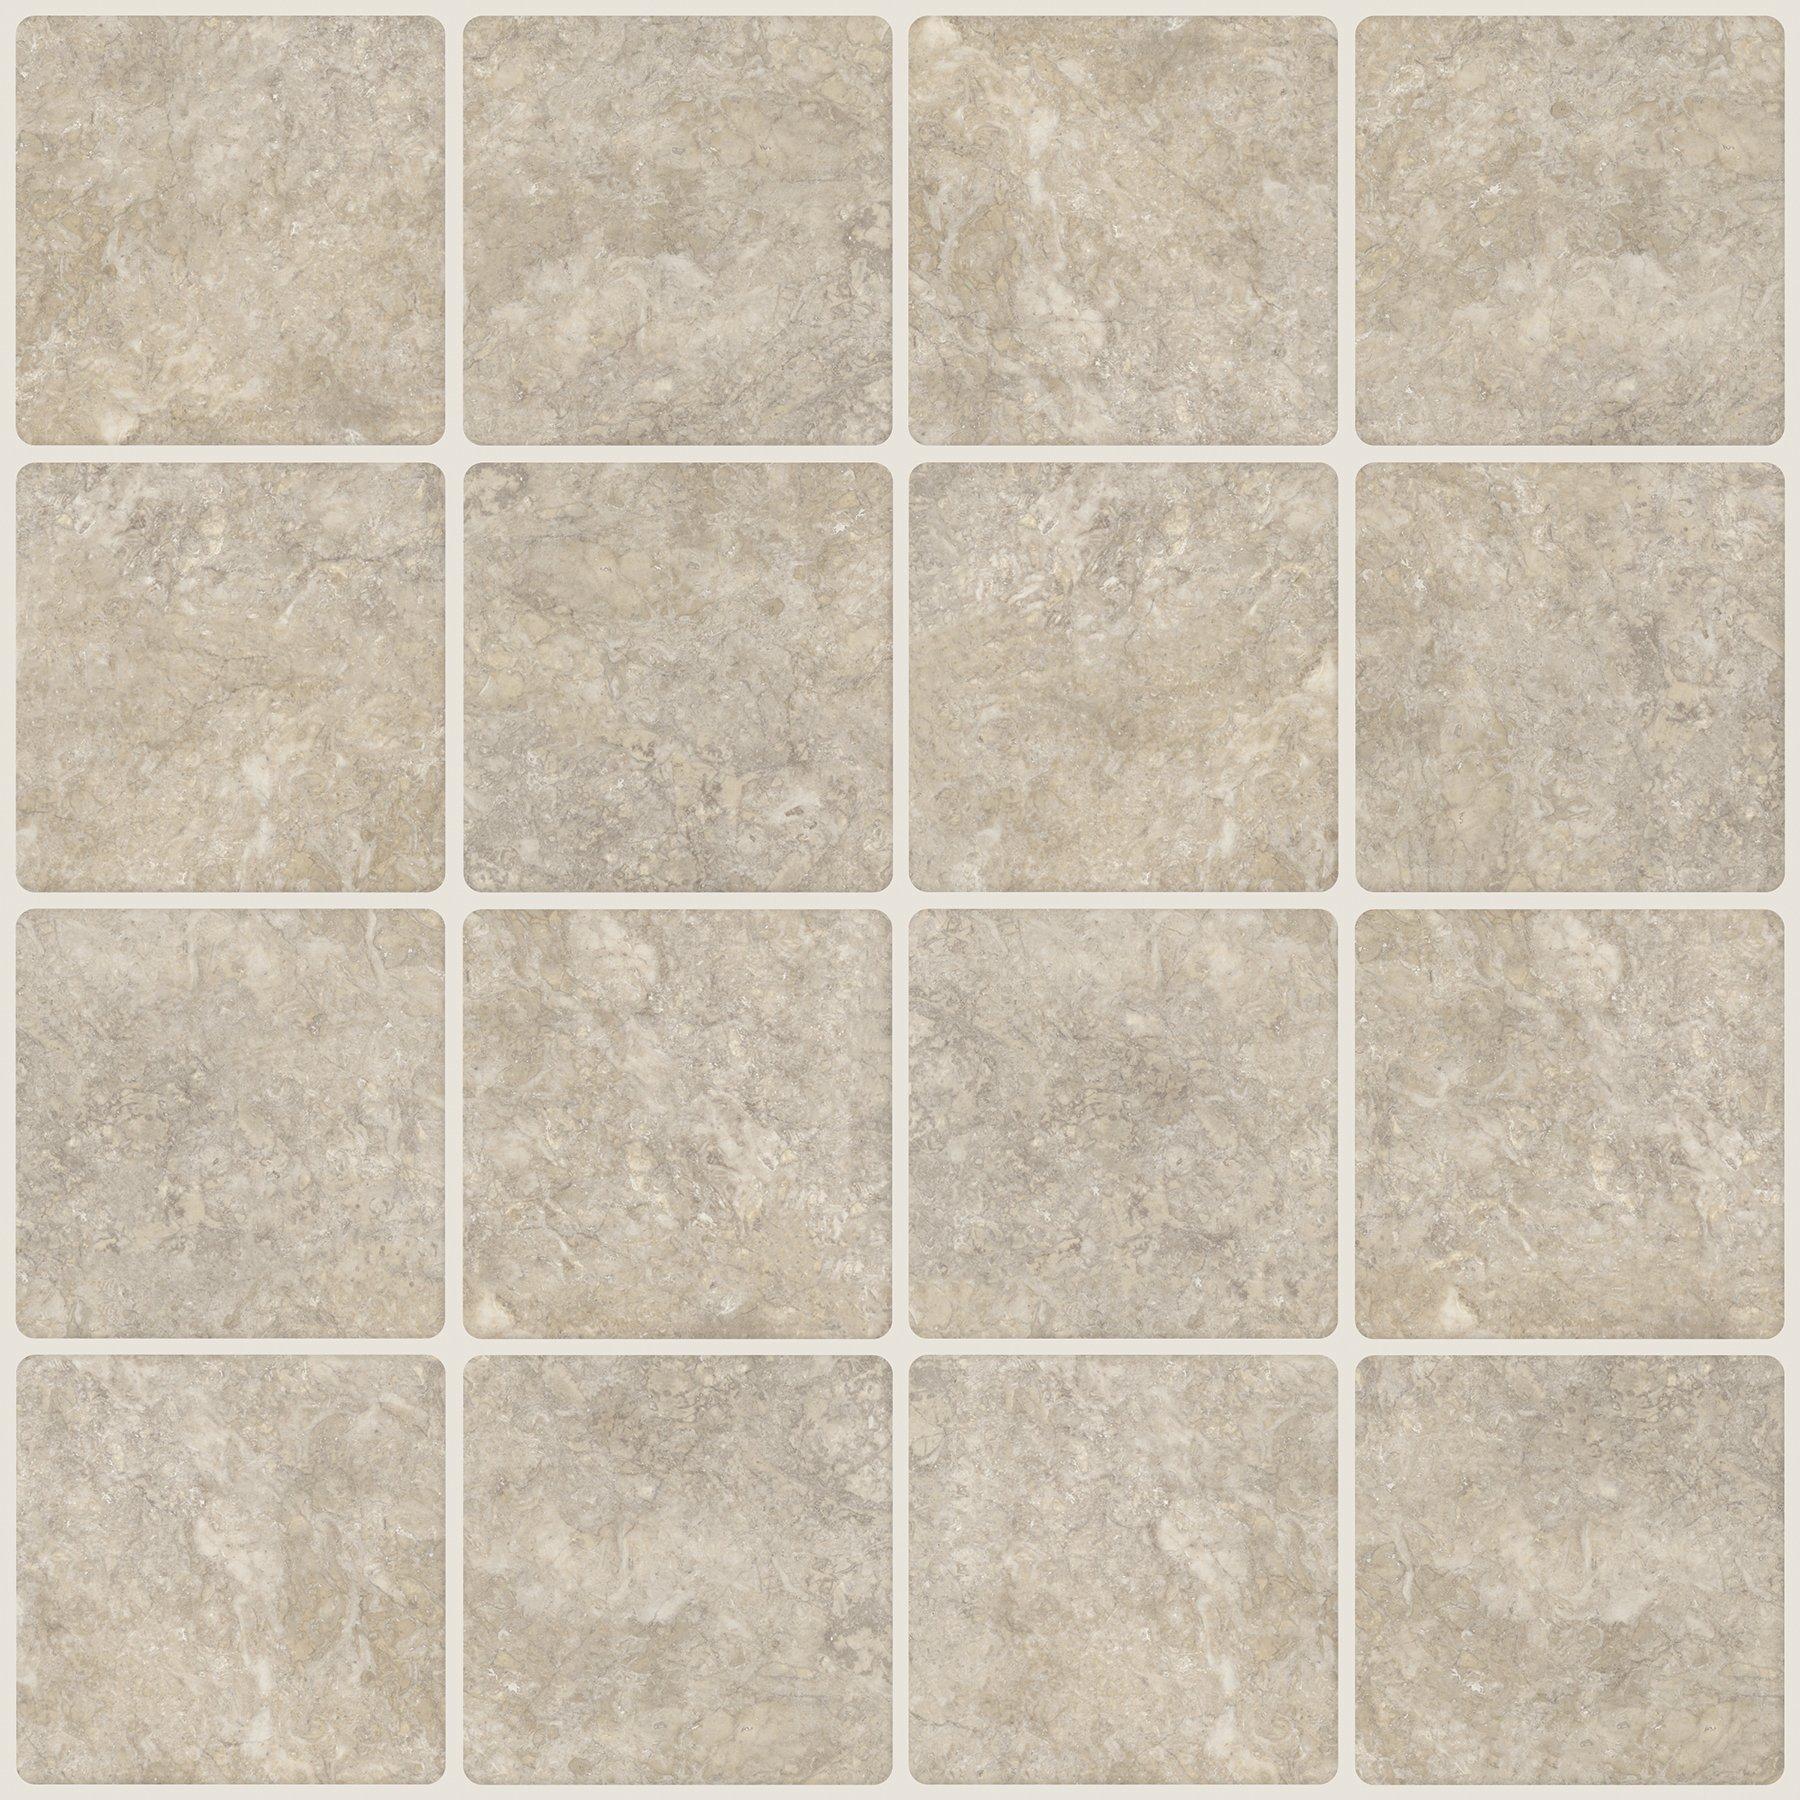 In Home NH2364 Travertine Squares Peel & Stick Backsplash Tiles Neutral